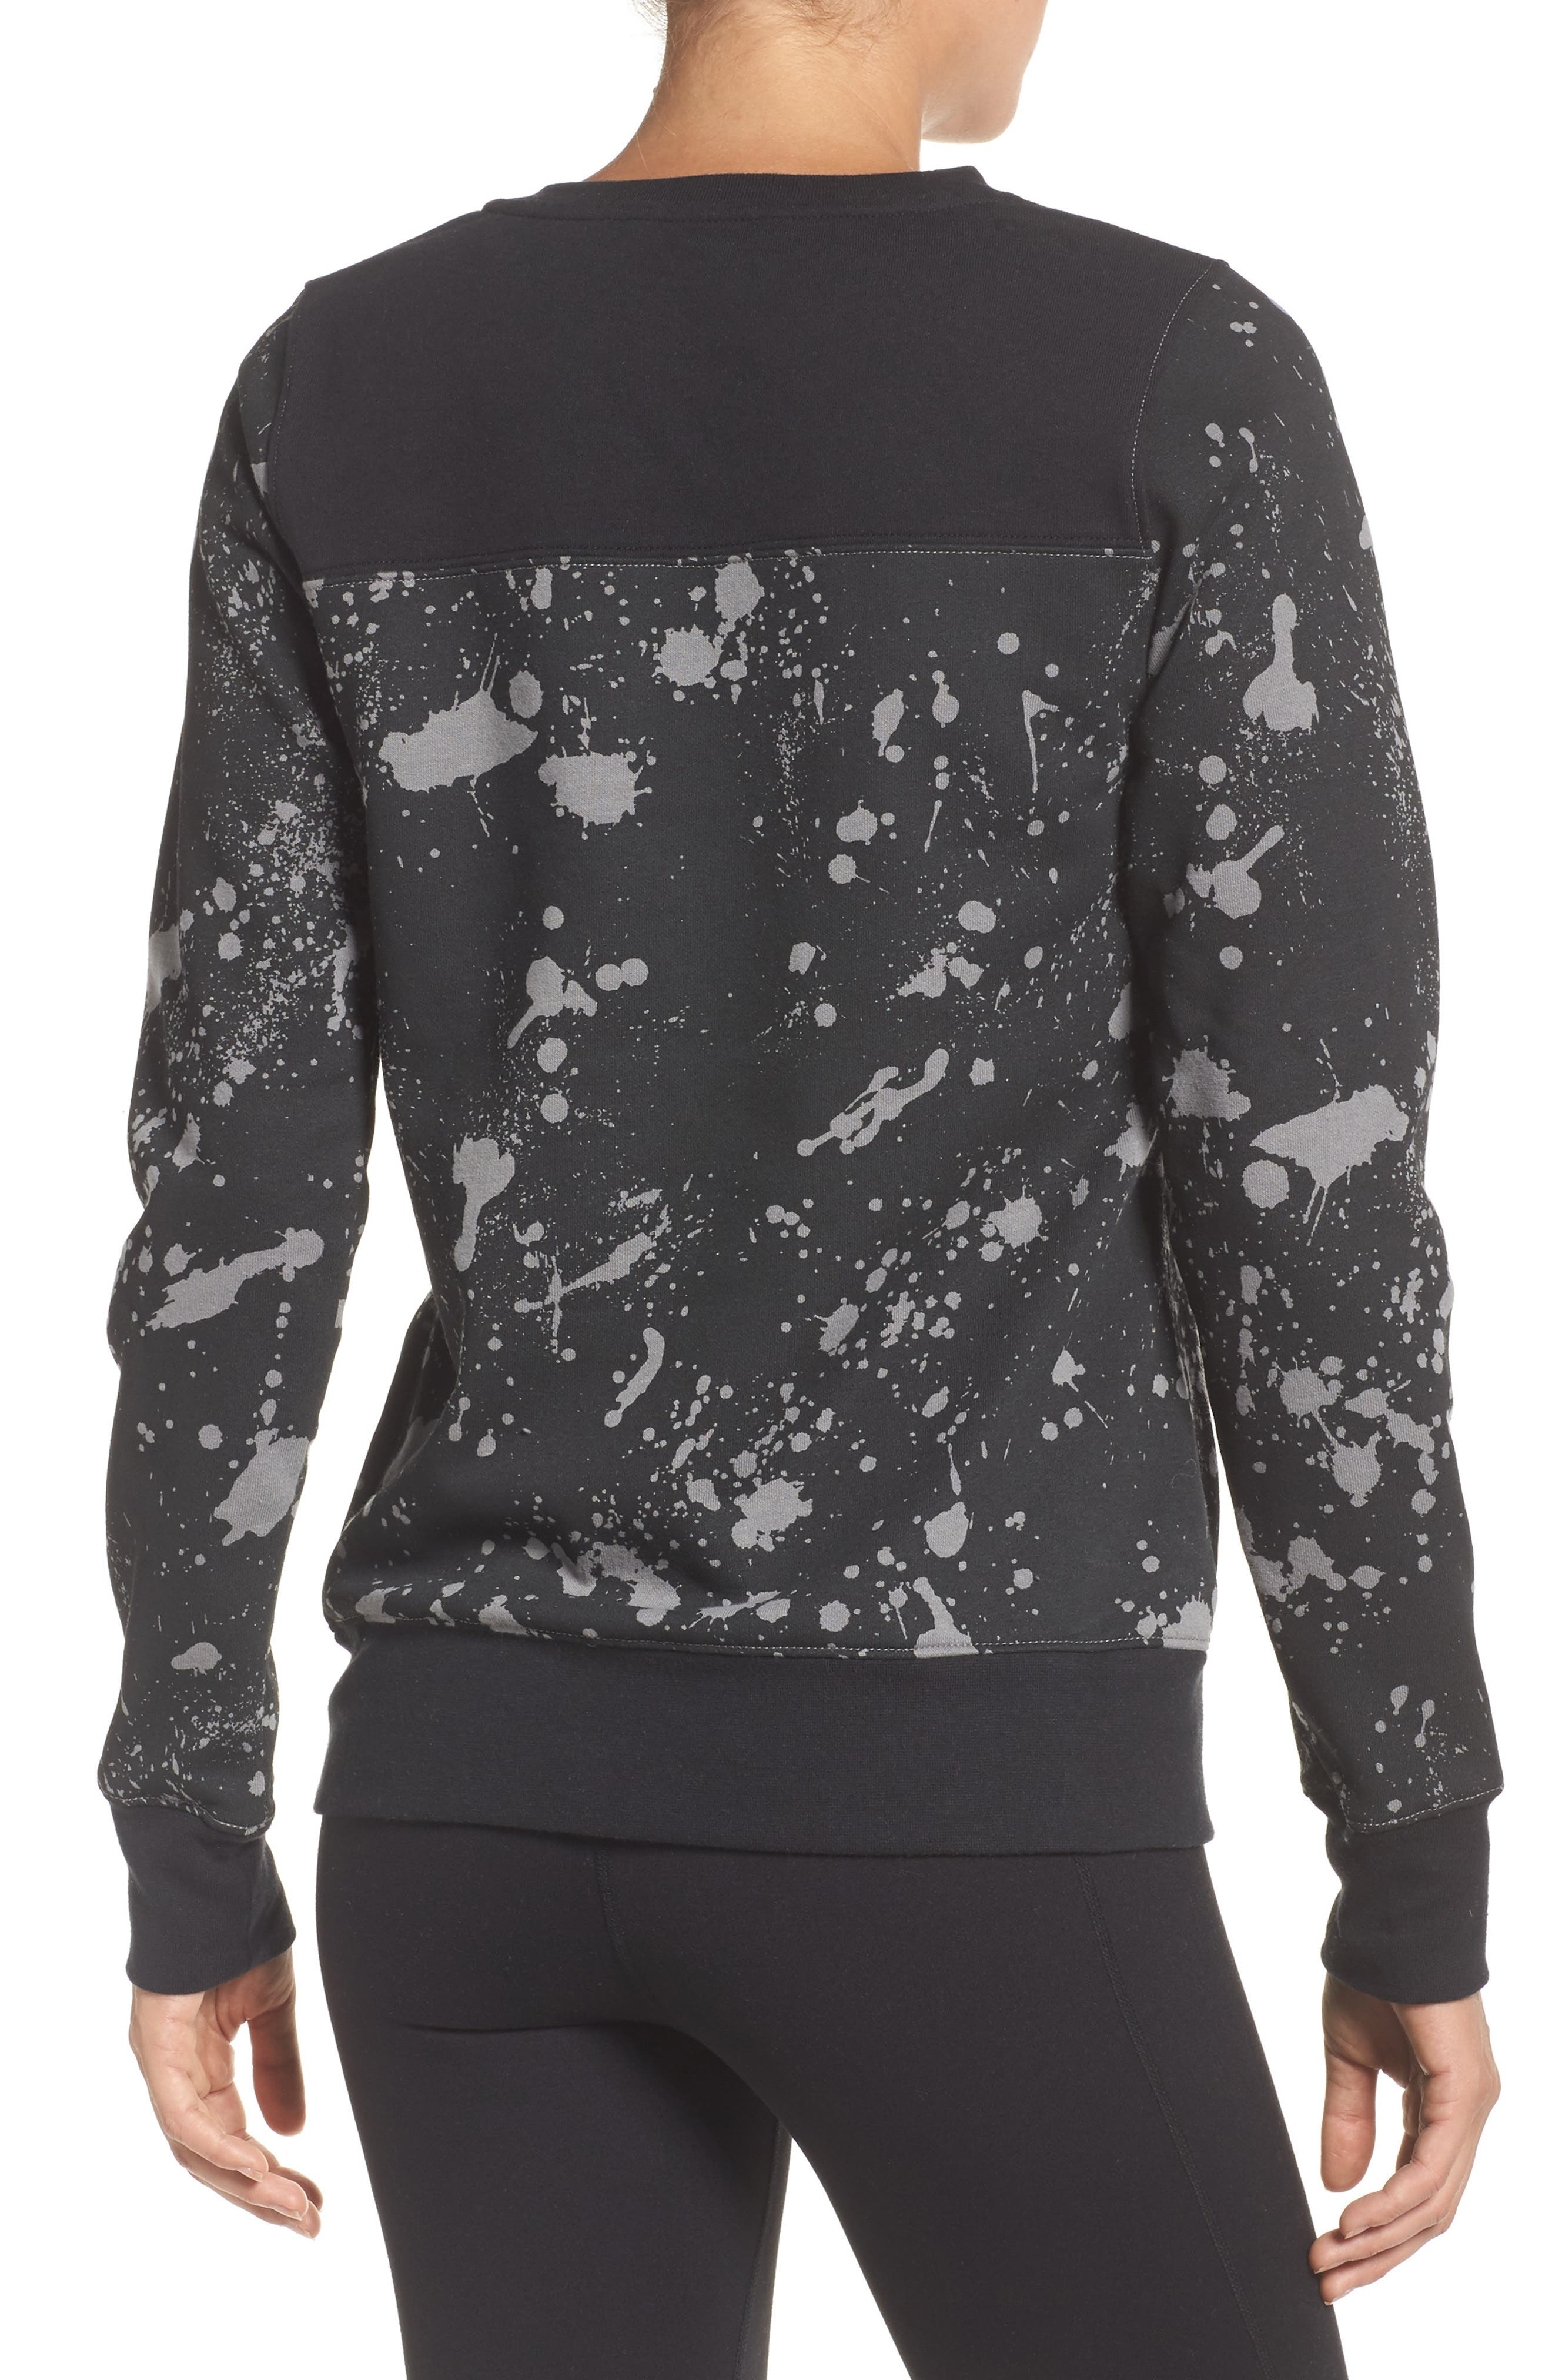 Half Dome Sweatshirt,                             Alternate thumbnail 2, color,                             Tnf Black Splatter Print